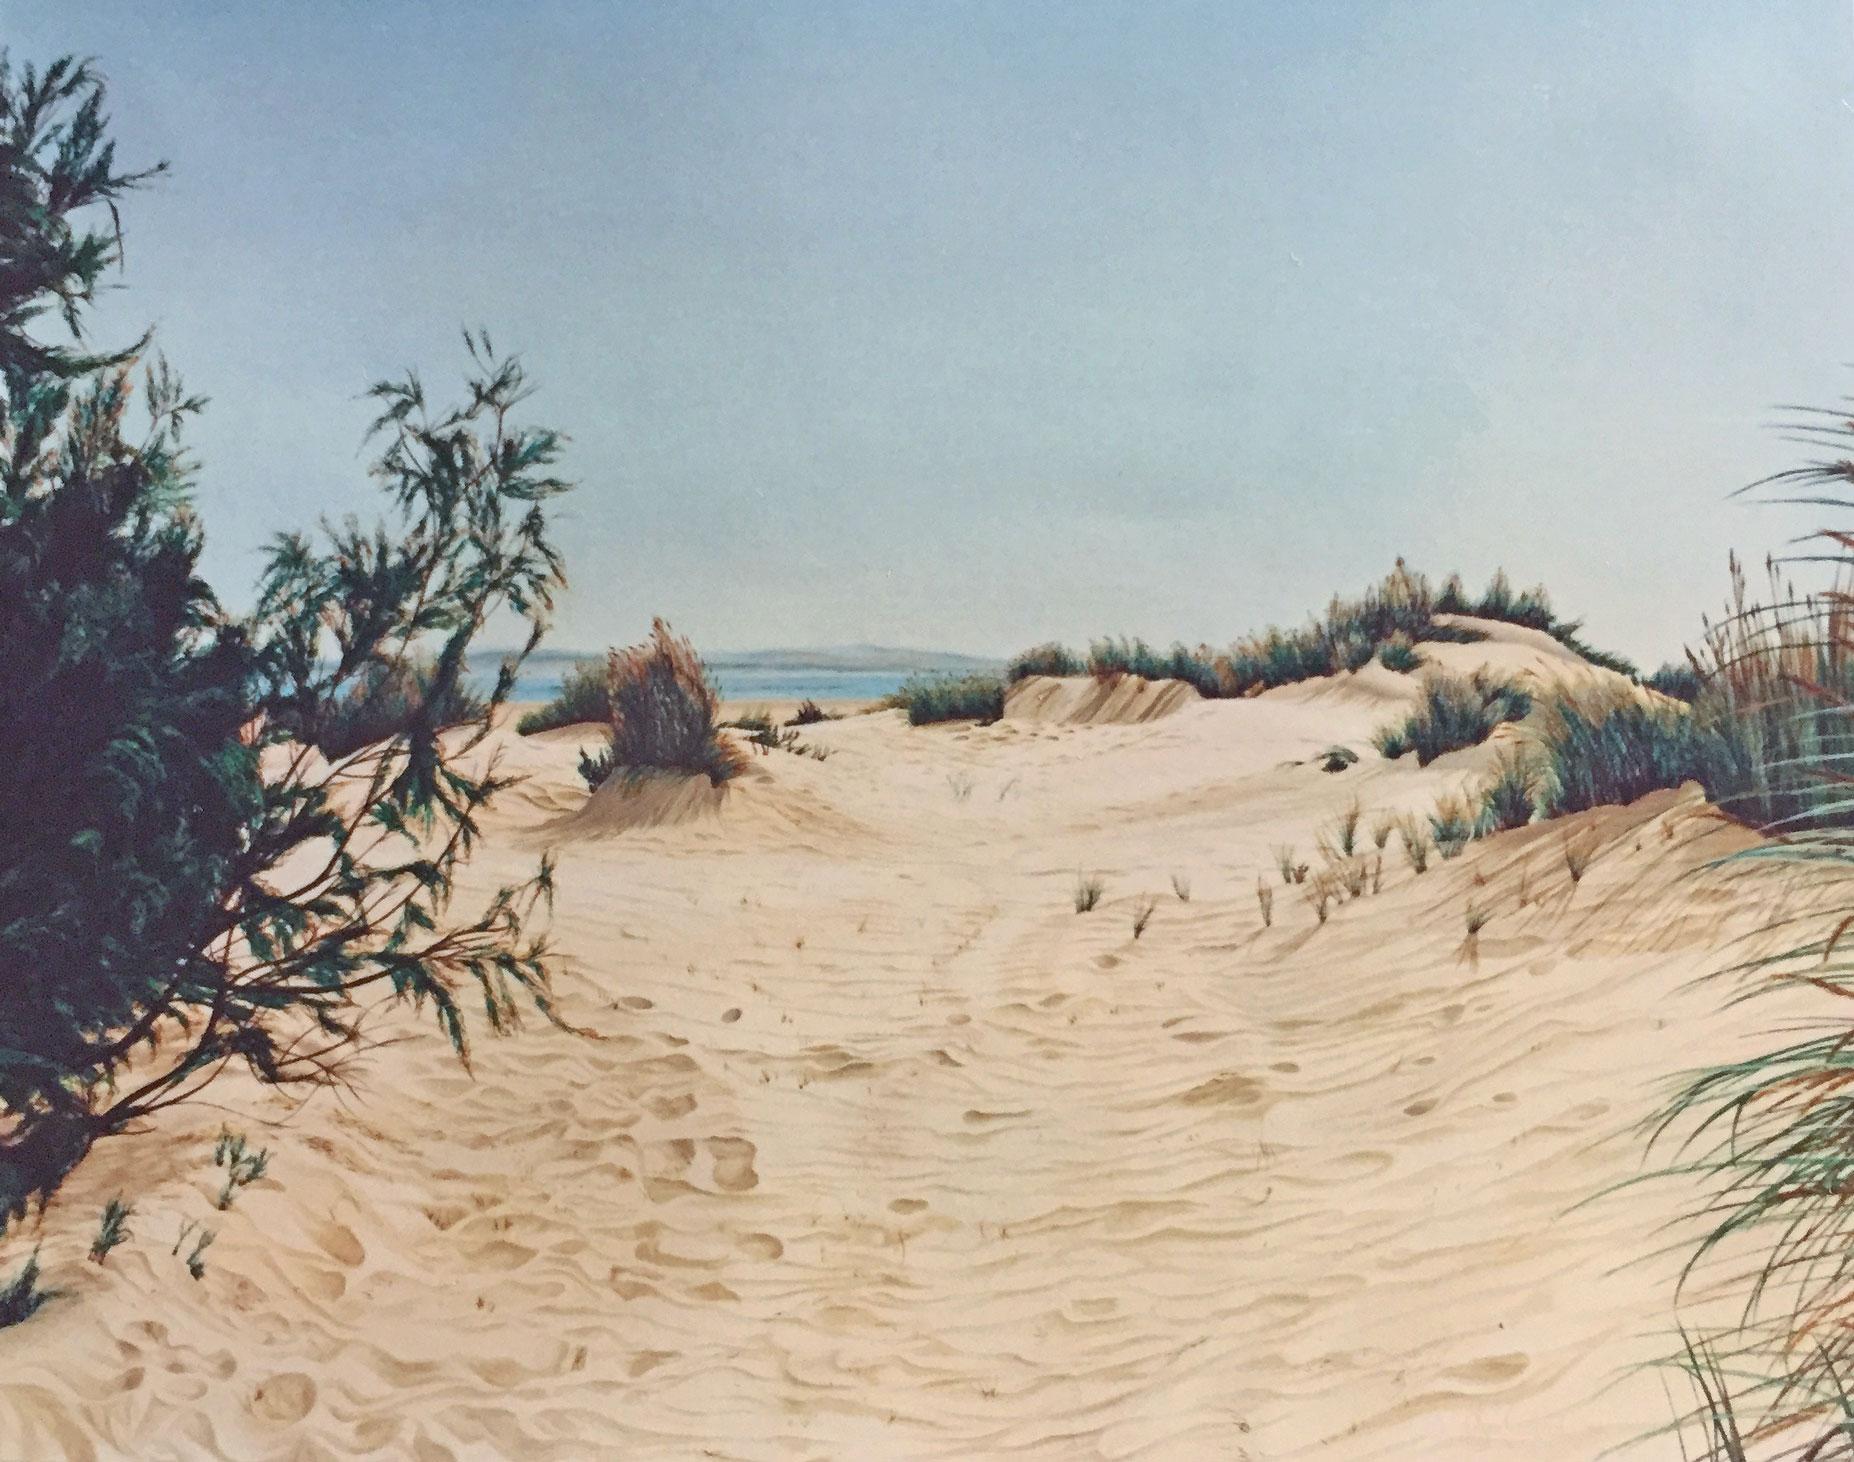 Sand Dunes in Coto Doñana and pine tree